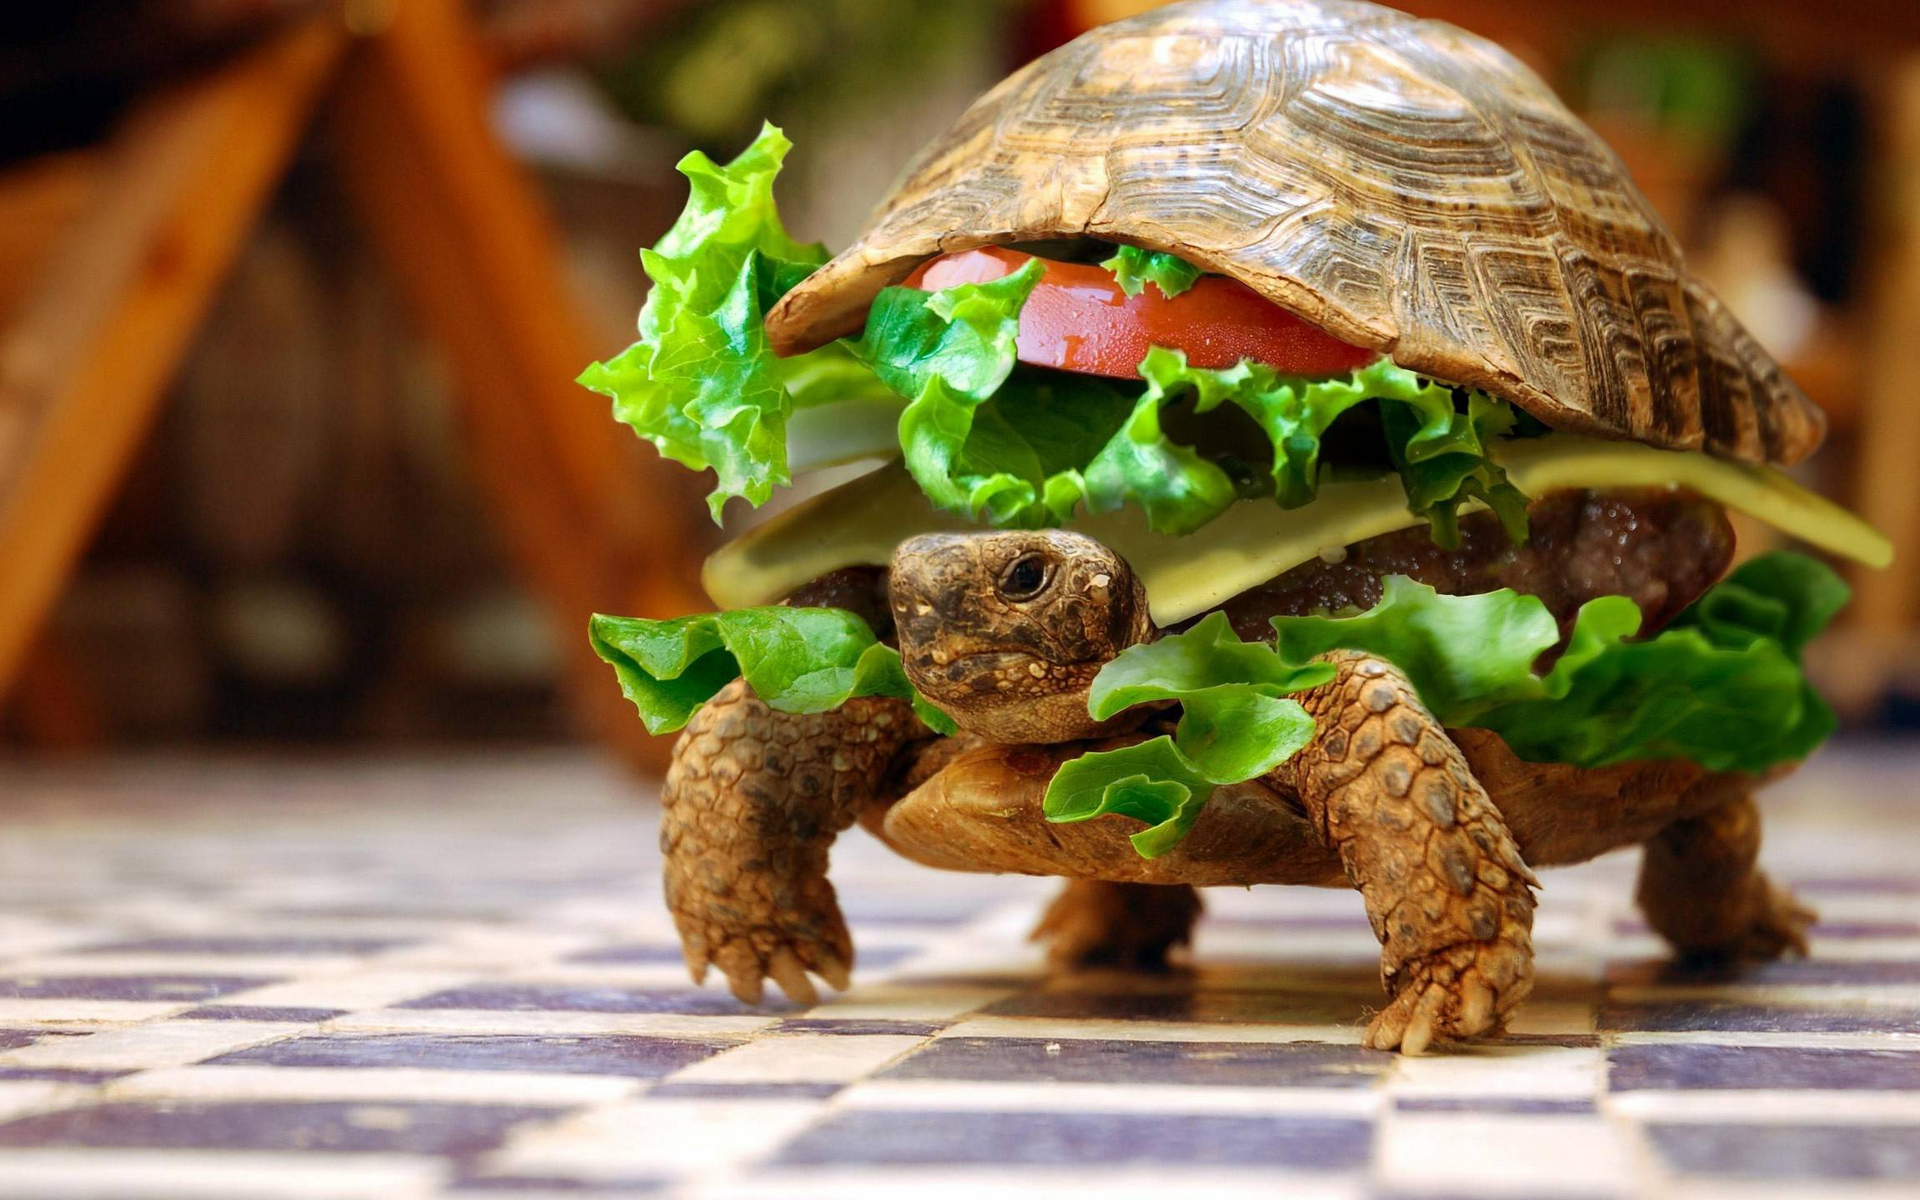 черепаха, чизбургер, панцирь